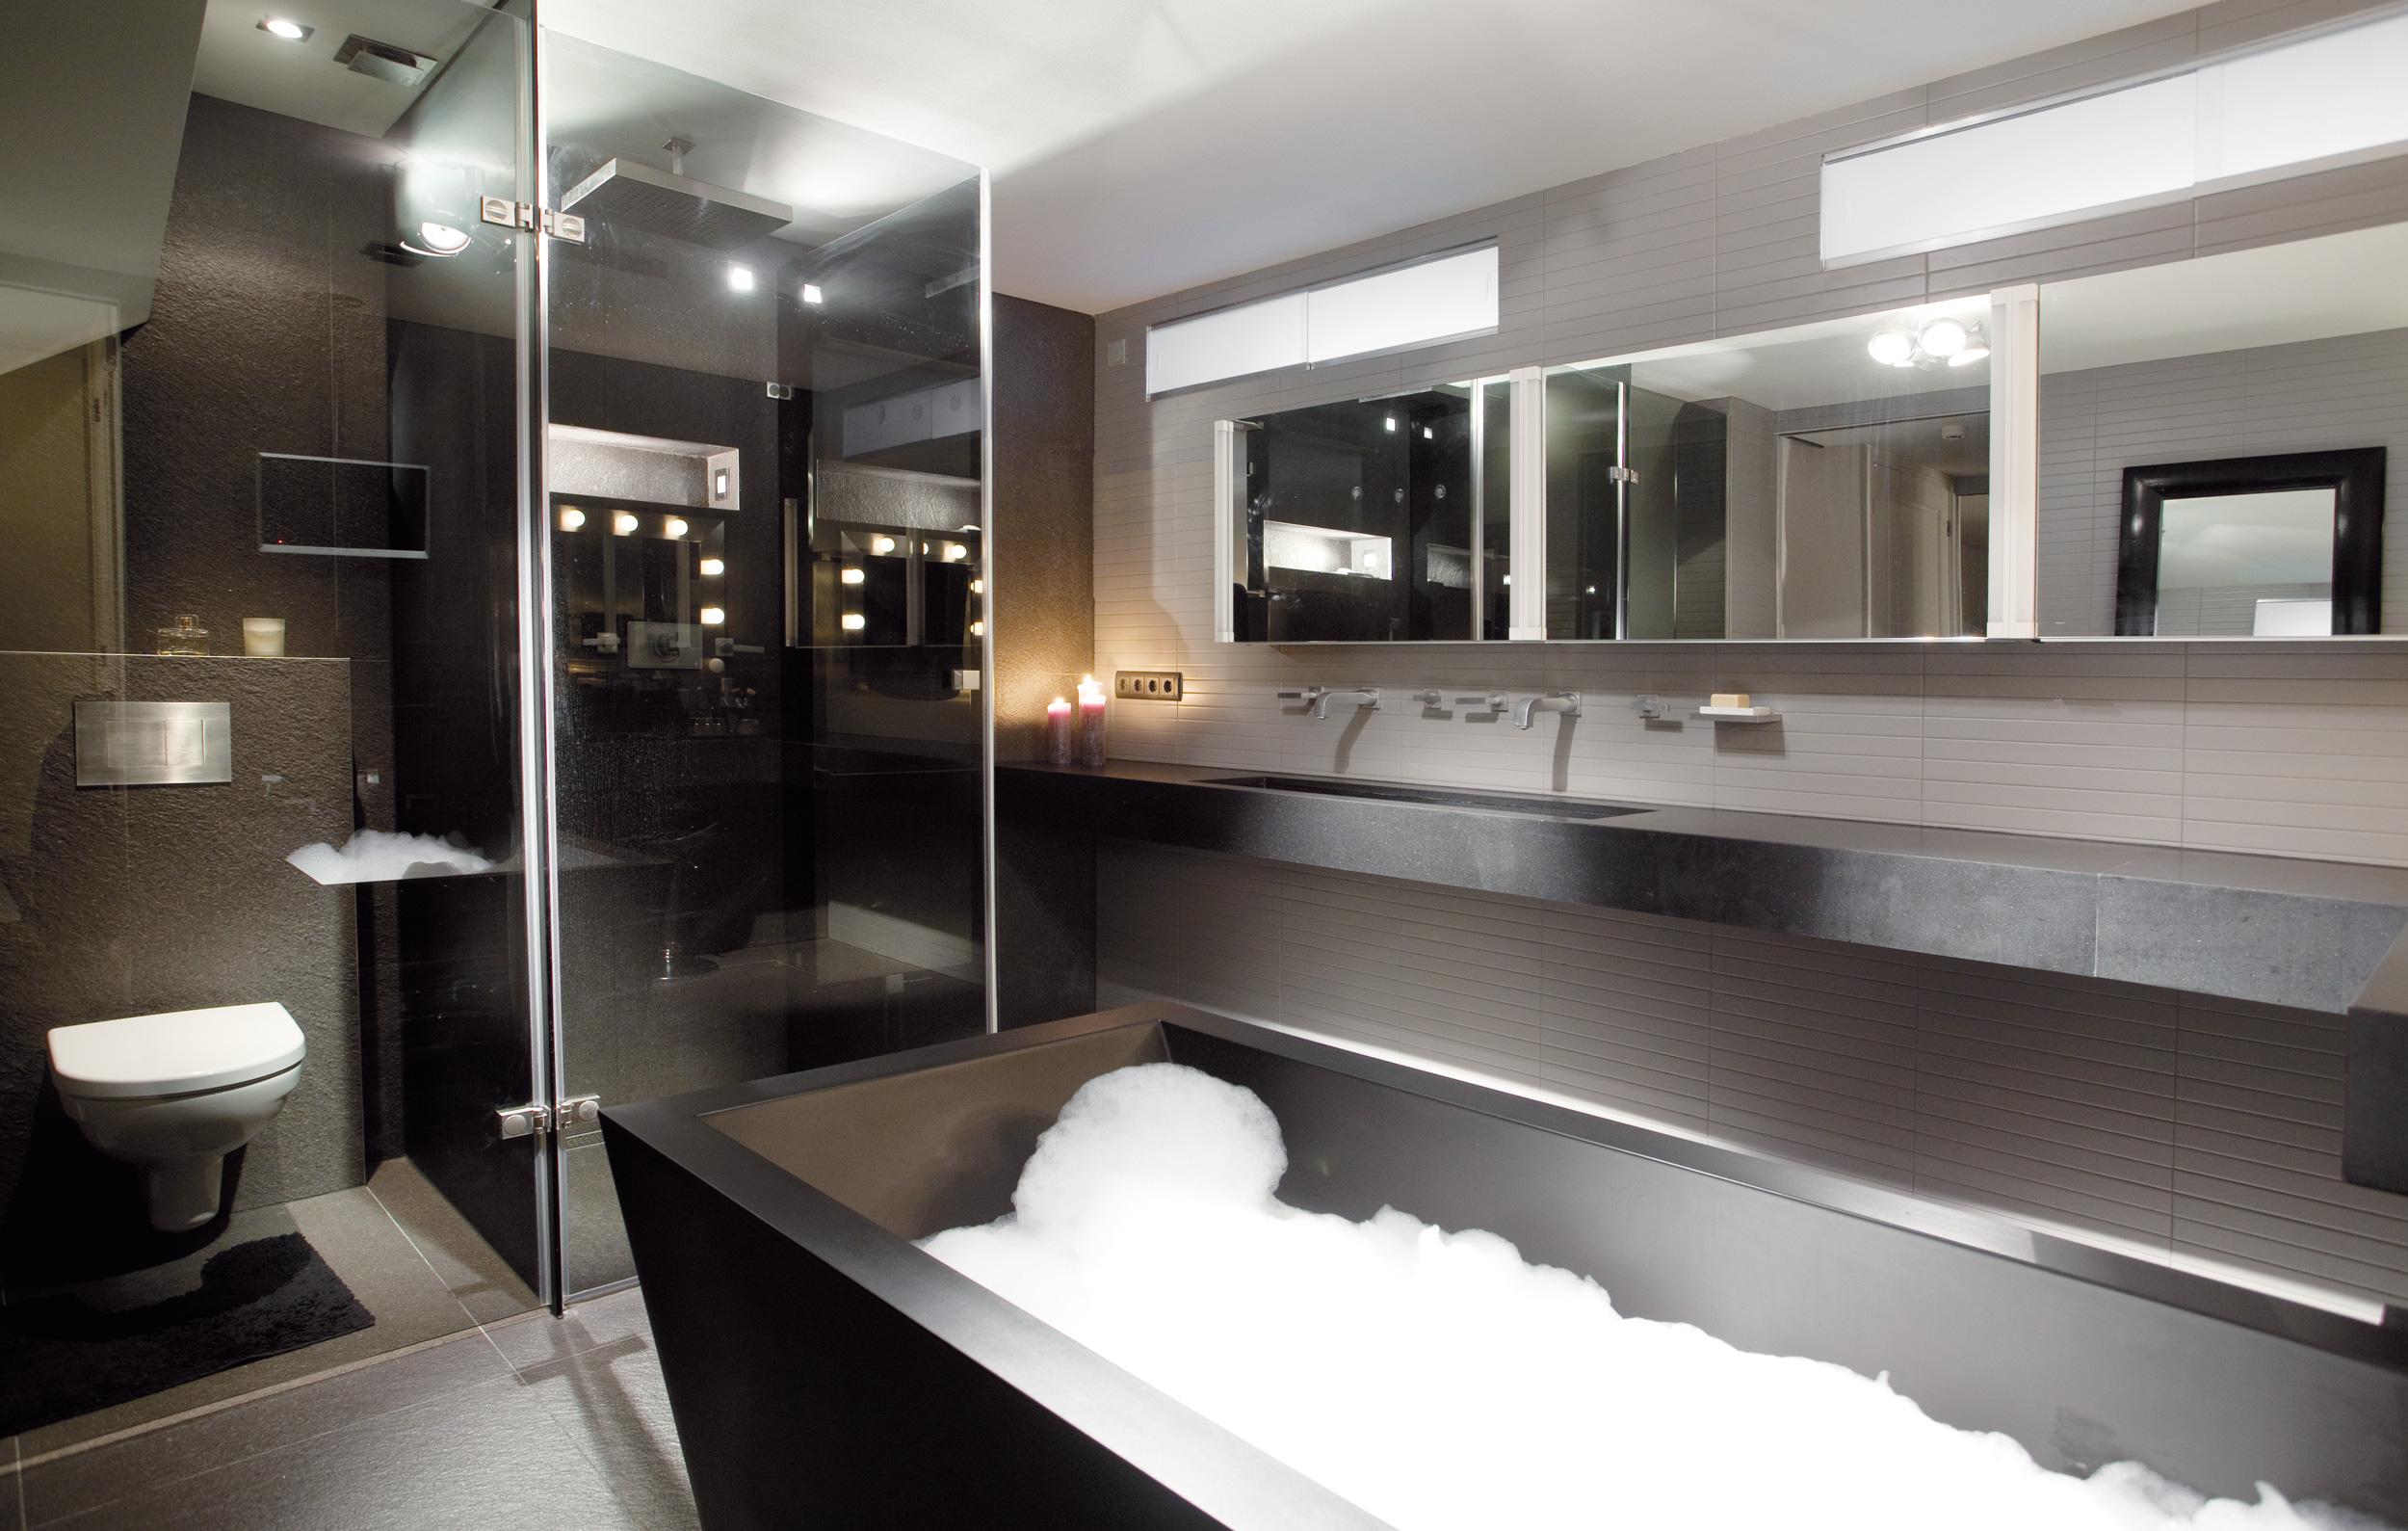 Badkamer Tegels Amsterdam : Penthouse amsterdam sjartec badkamers wellness en tegels in leiden